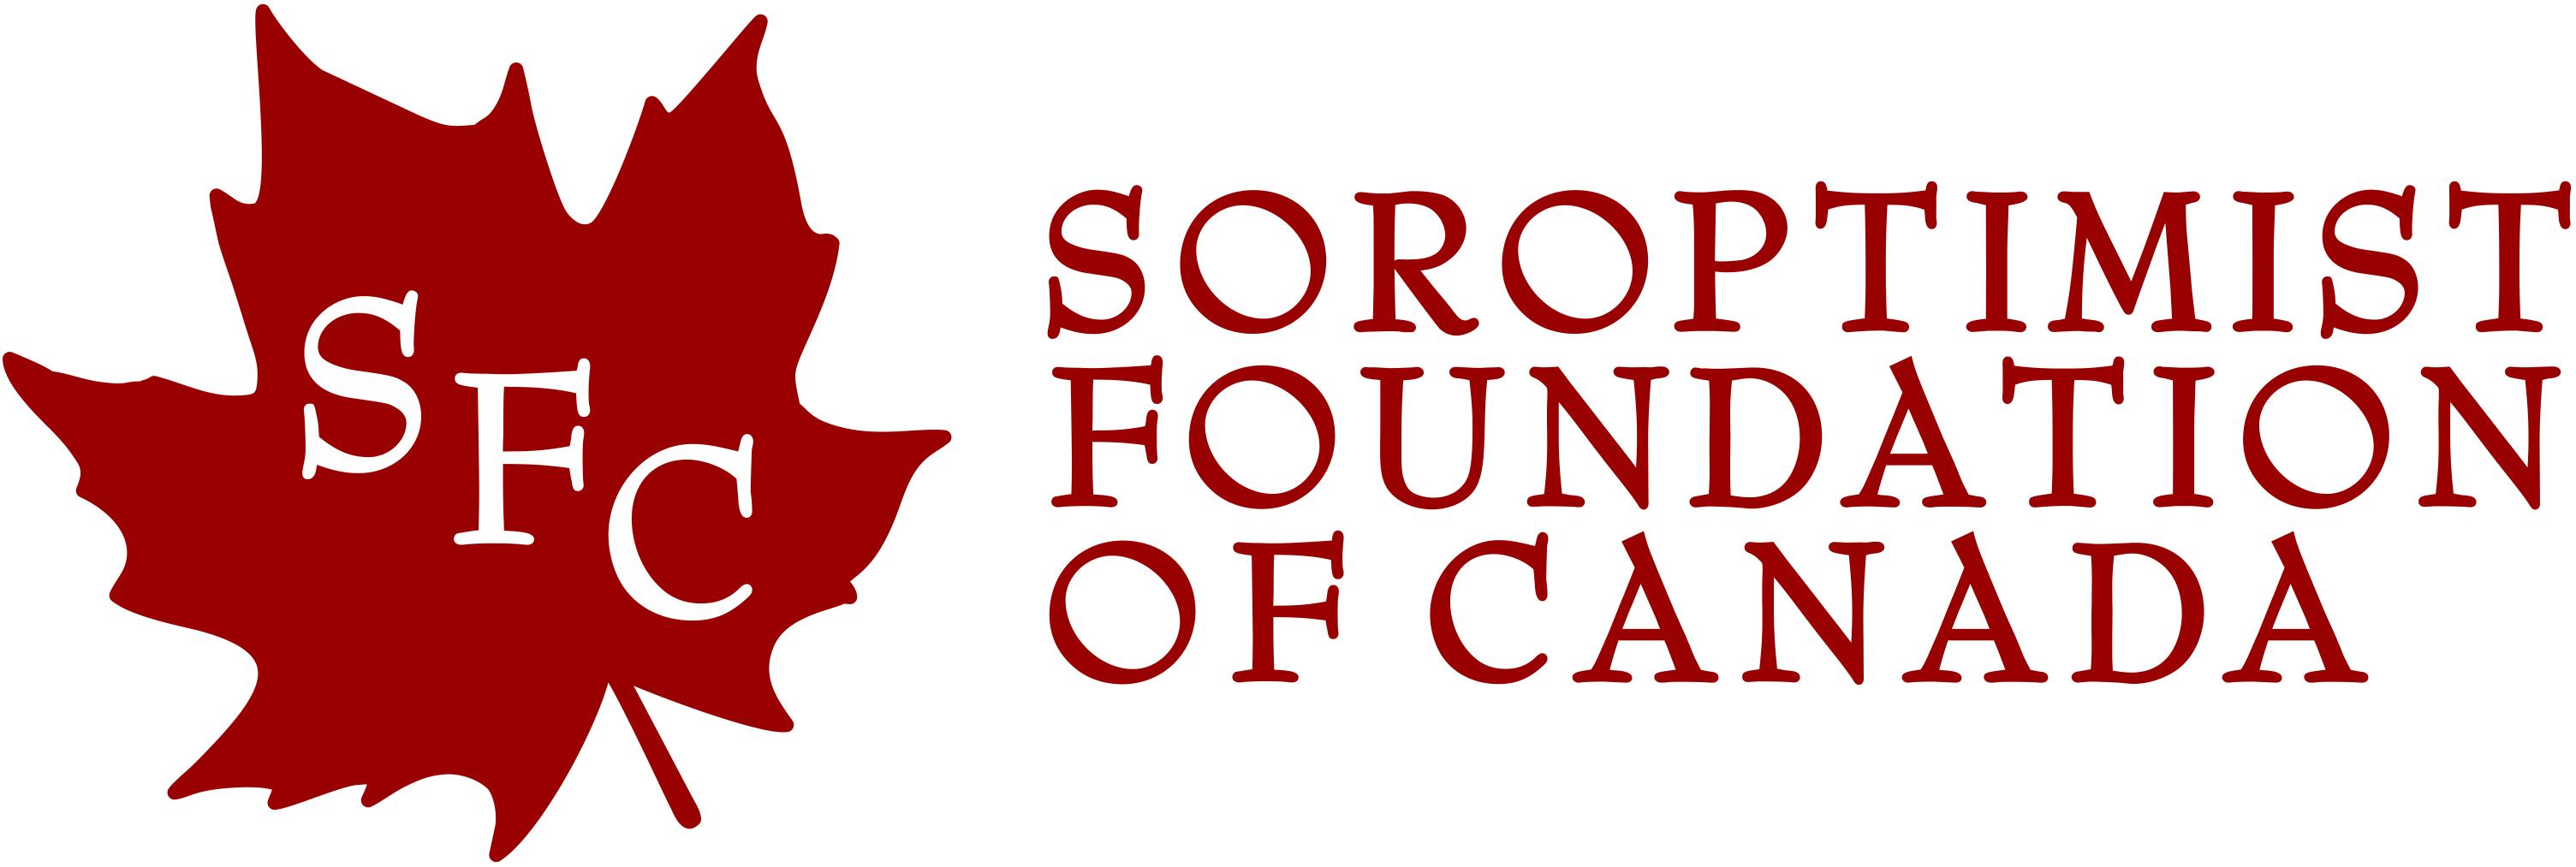 Soroptimist Foundation of Canada